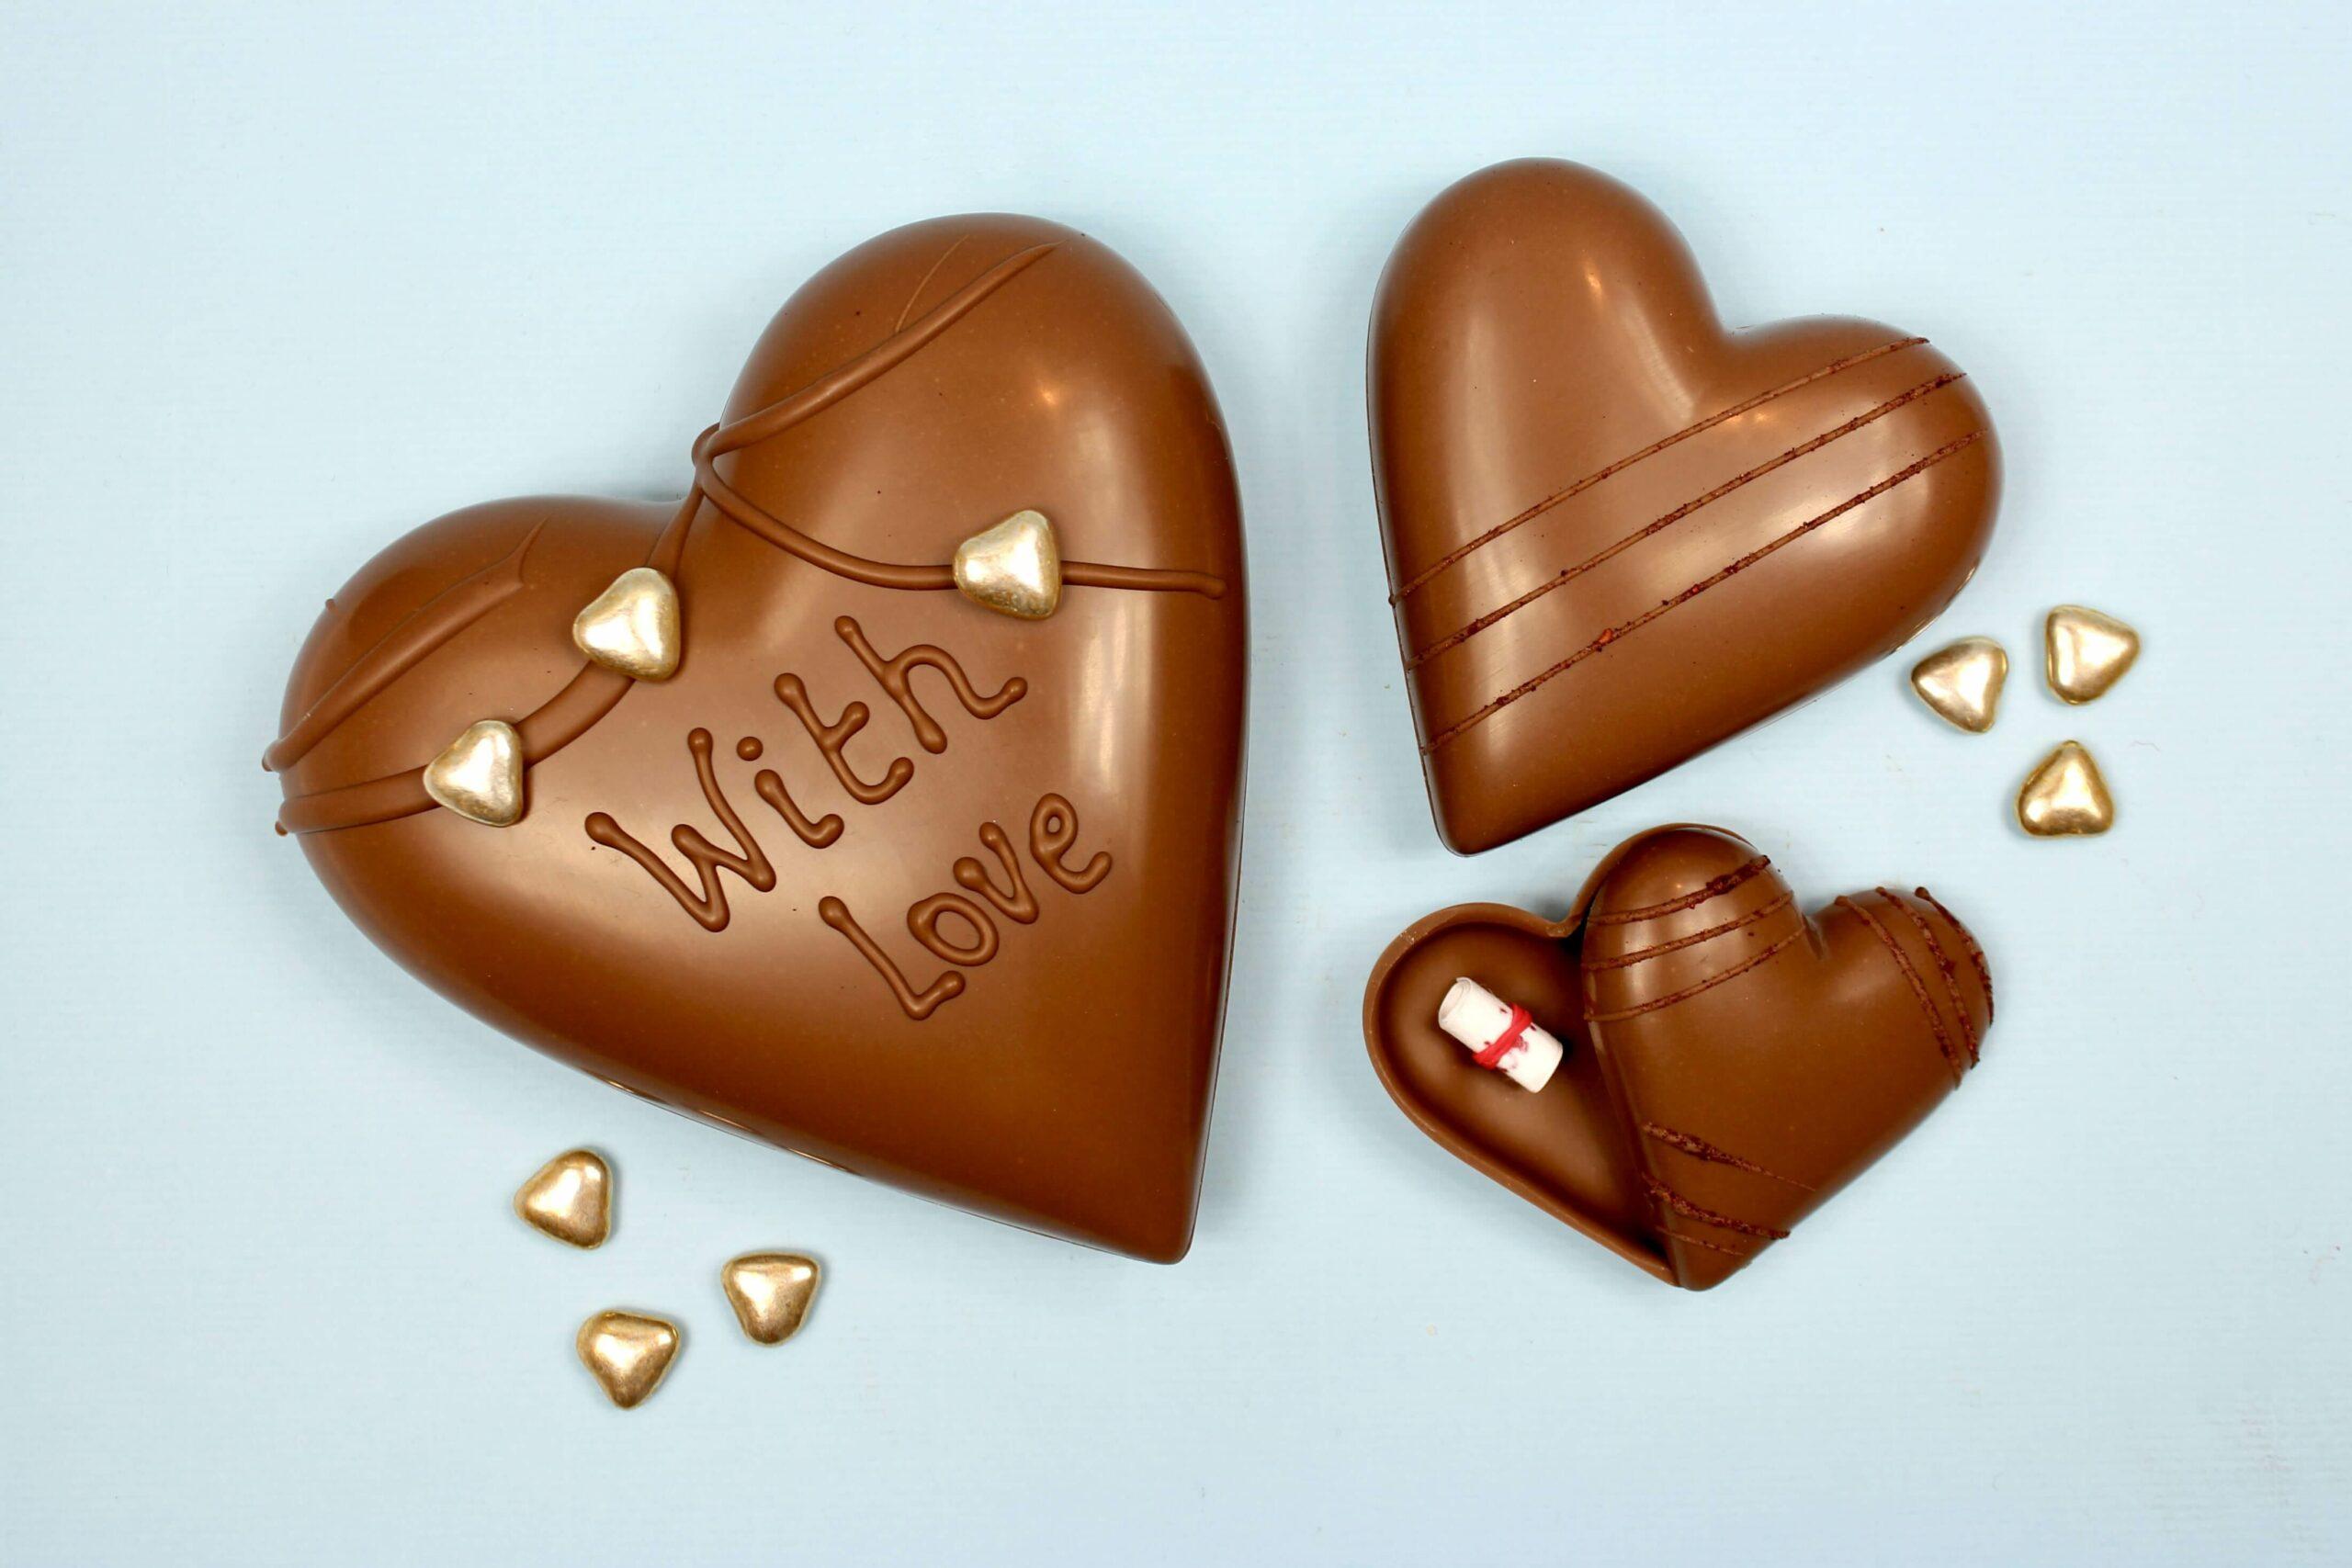 hd ghent matroeska heart milk chocolate valentine 2021 set of tree